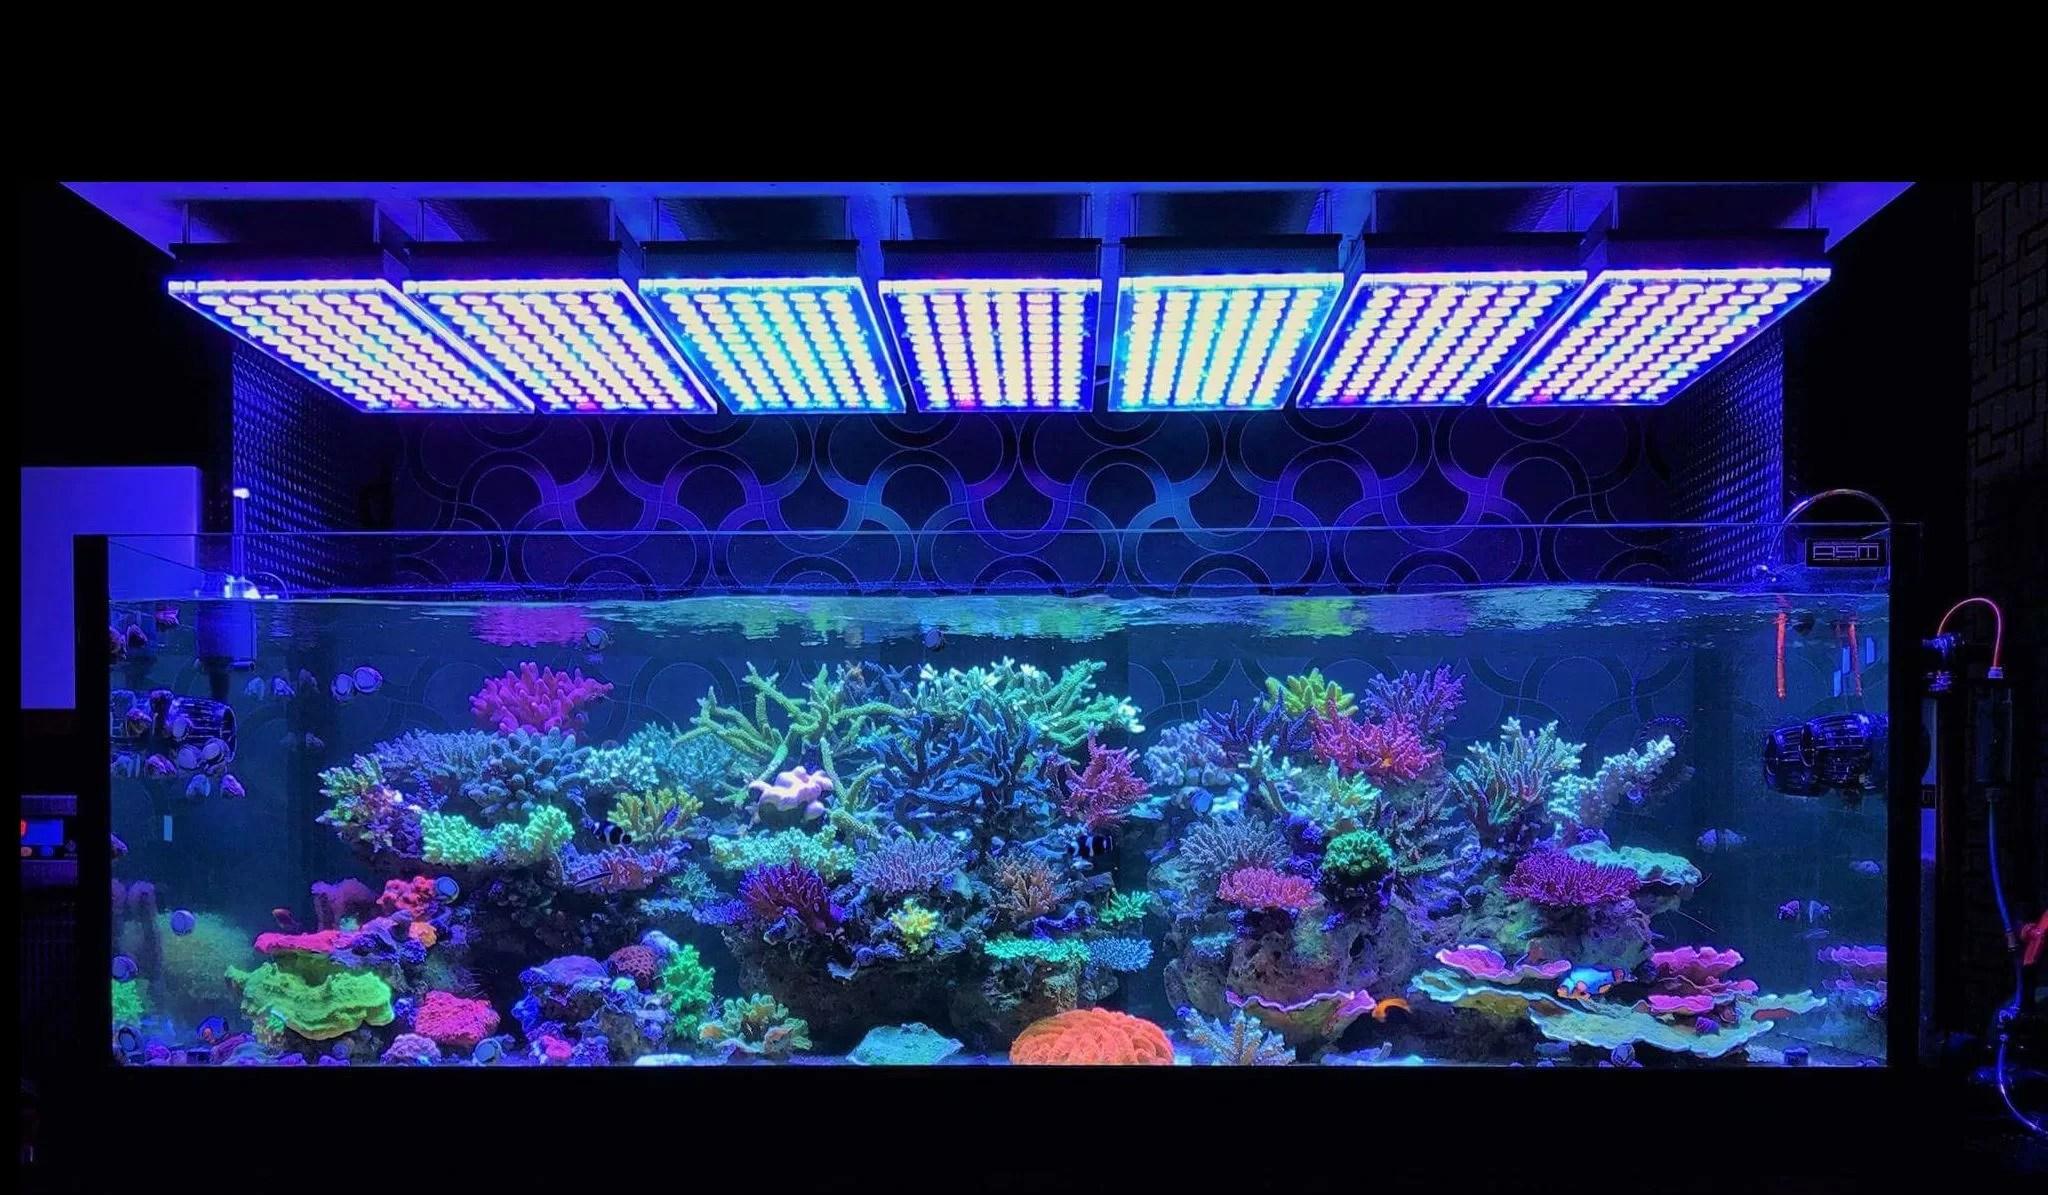 Atlantik V4 Reef Aquarium Led Beleuchtung Orphek